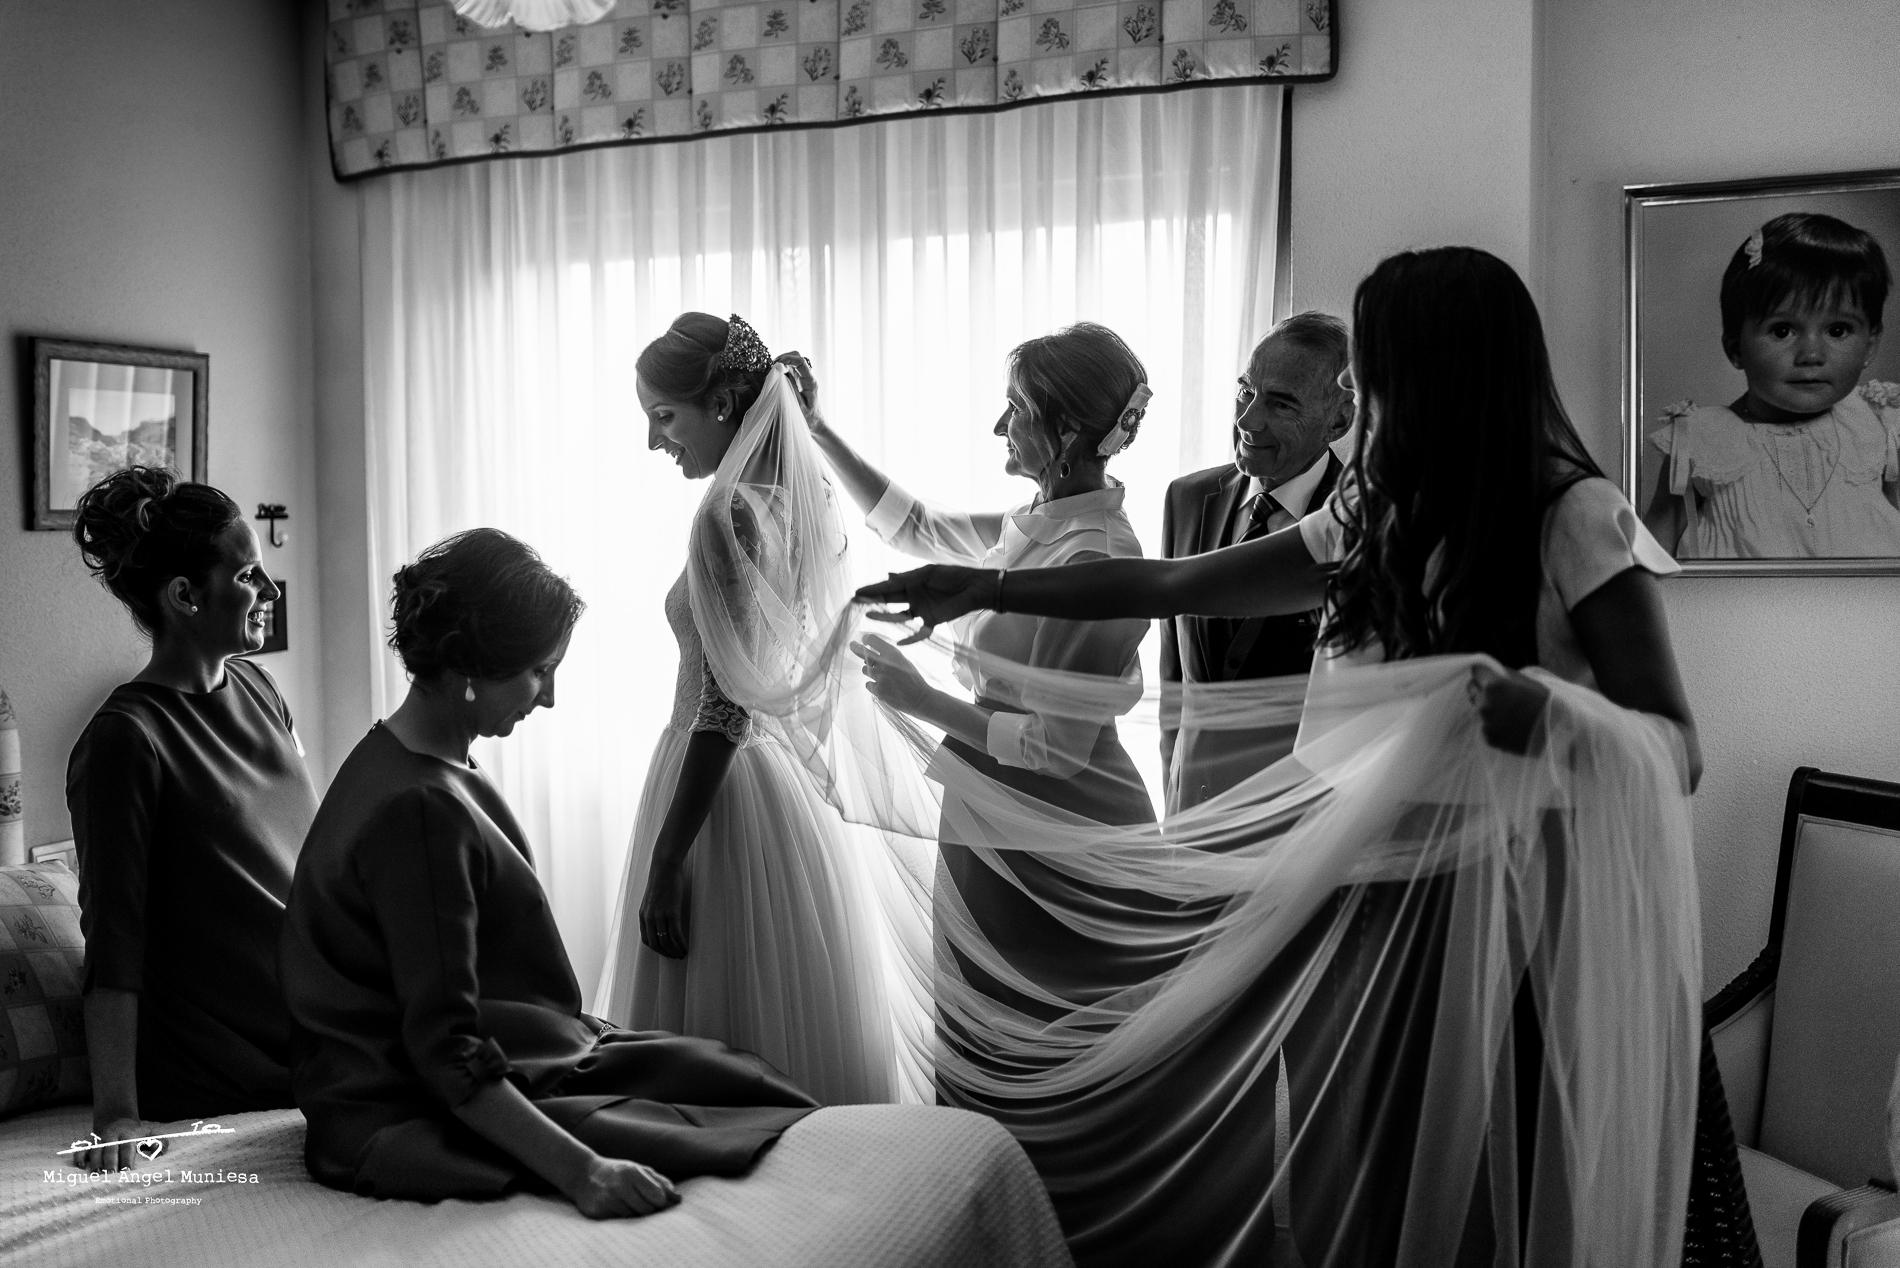 miguel angel muniesa, fotografo boda Teruel, fotografo boda navarra, fotografo boda zaragoza, fotografo boda soria, miguel angel muniesa emotional photography_10